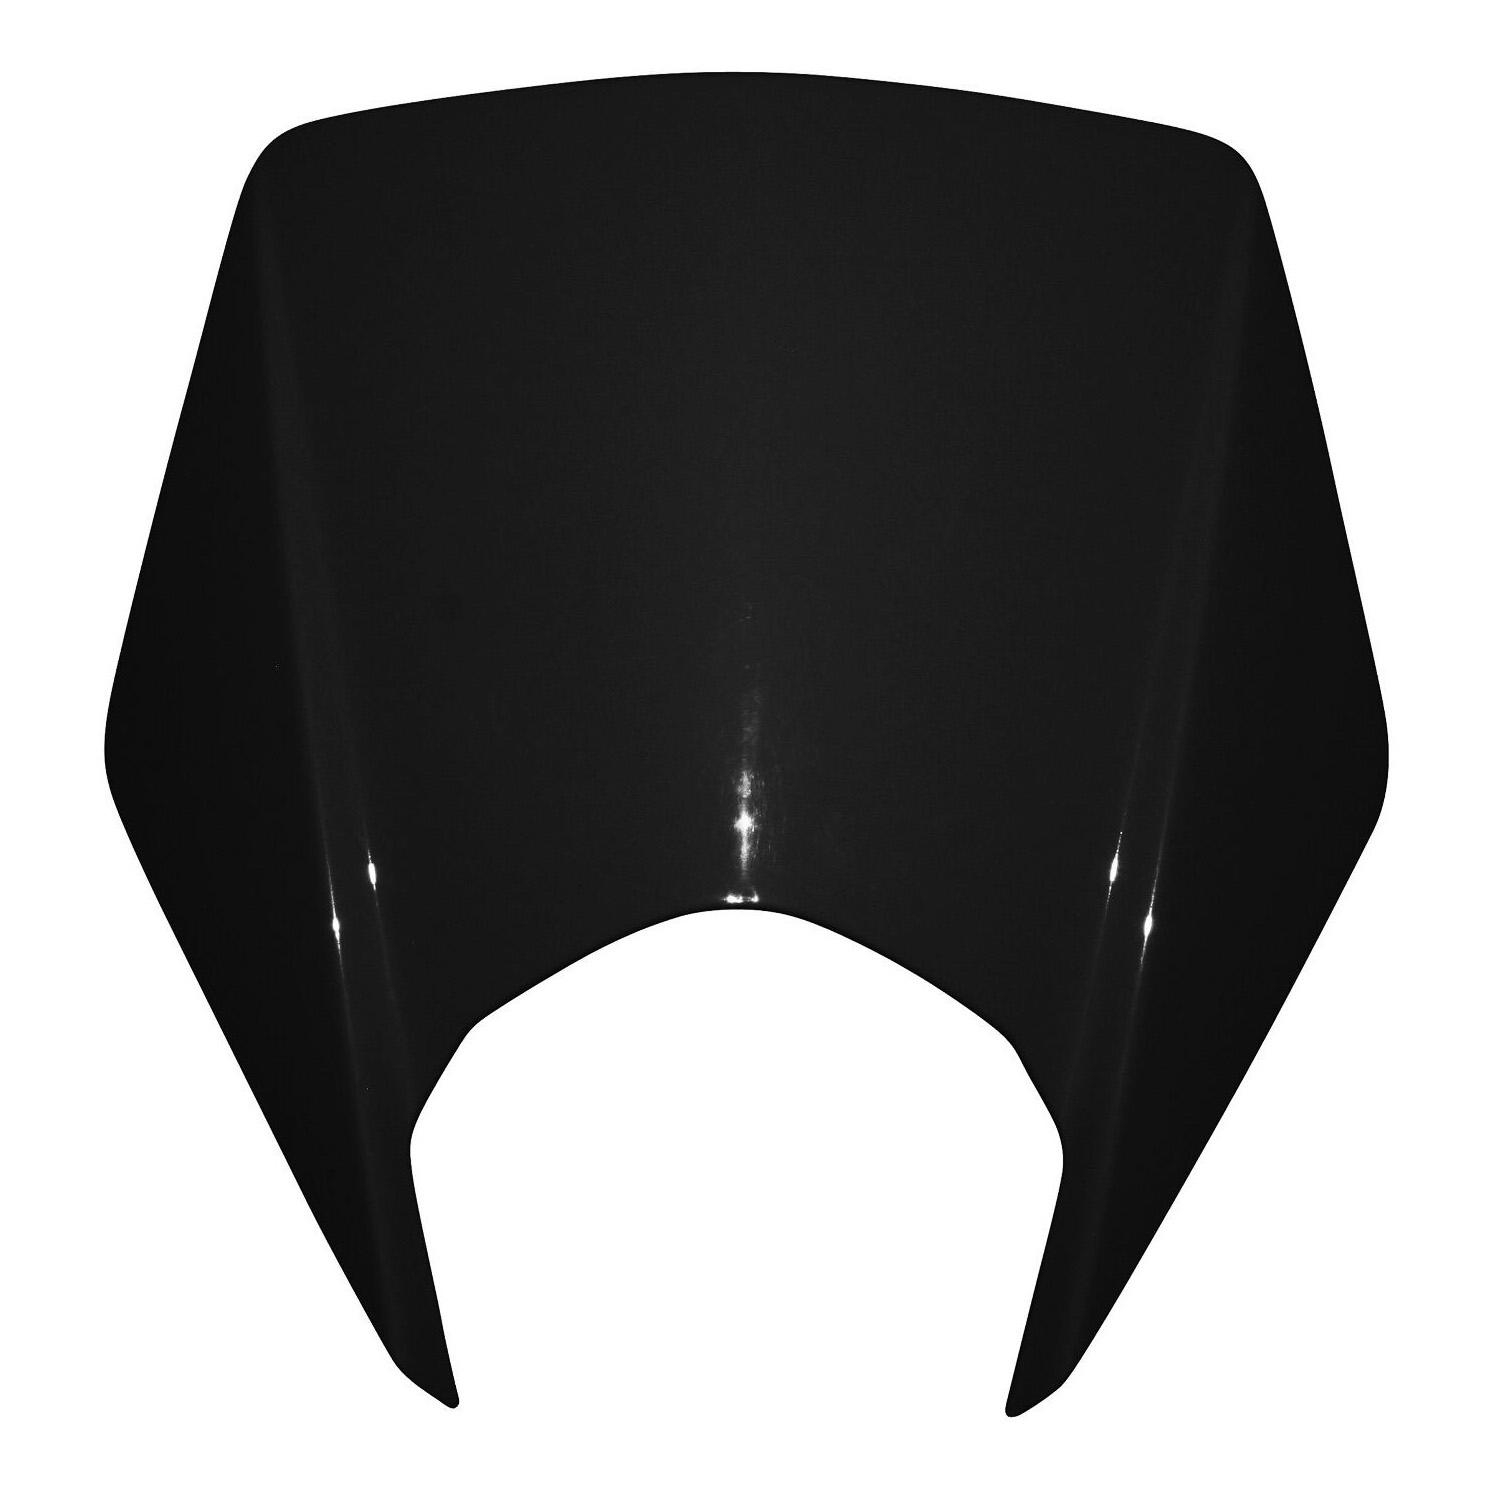 Tête de fourche 1Tek Origine noir brillant Derbi Senda DRD 2011-